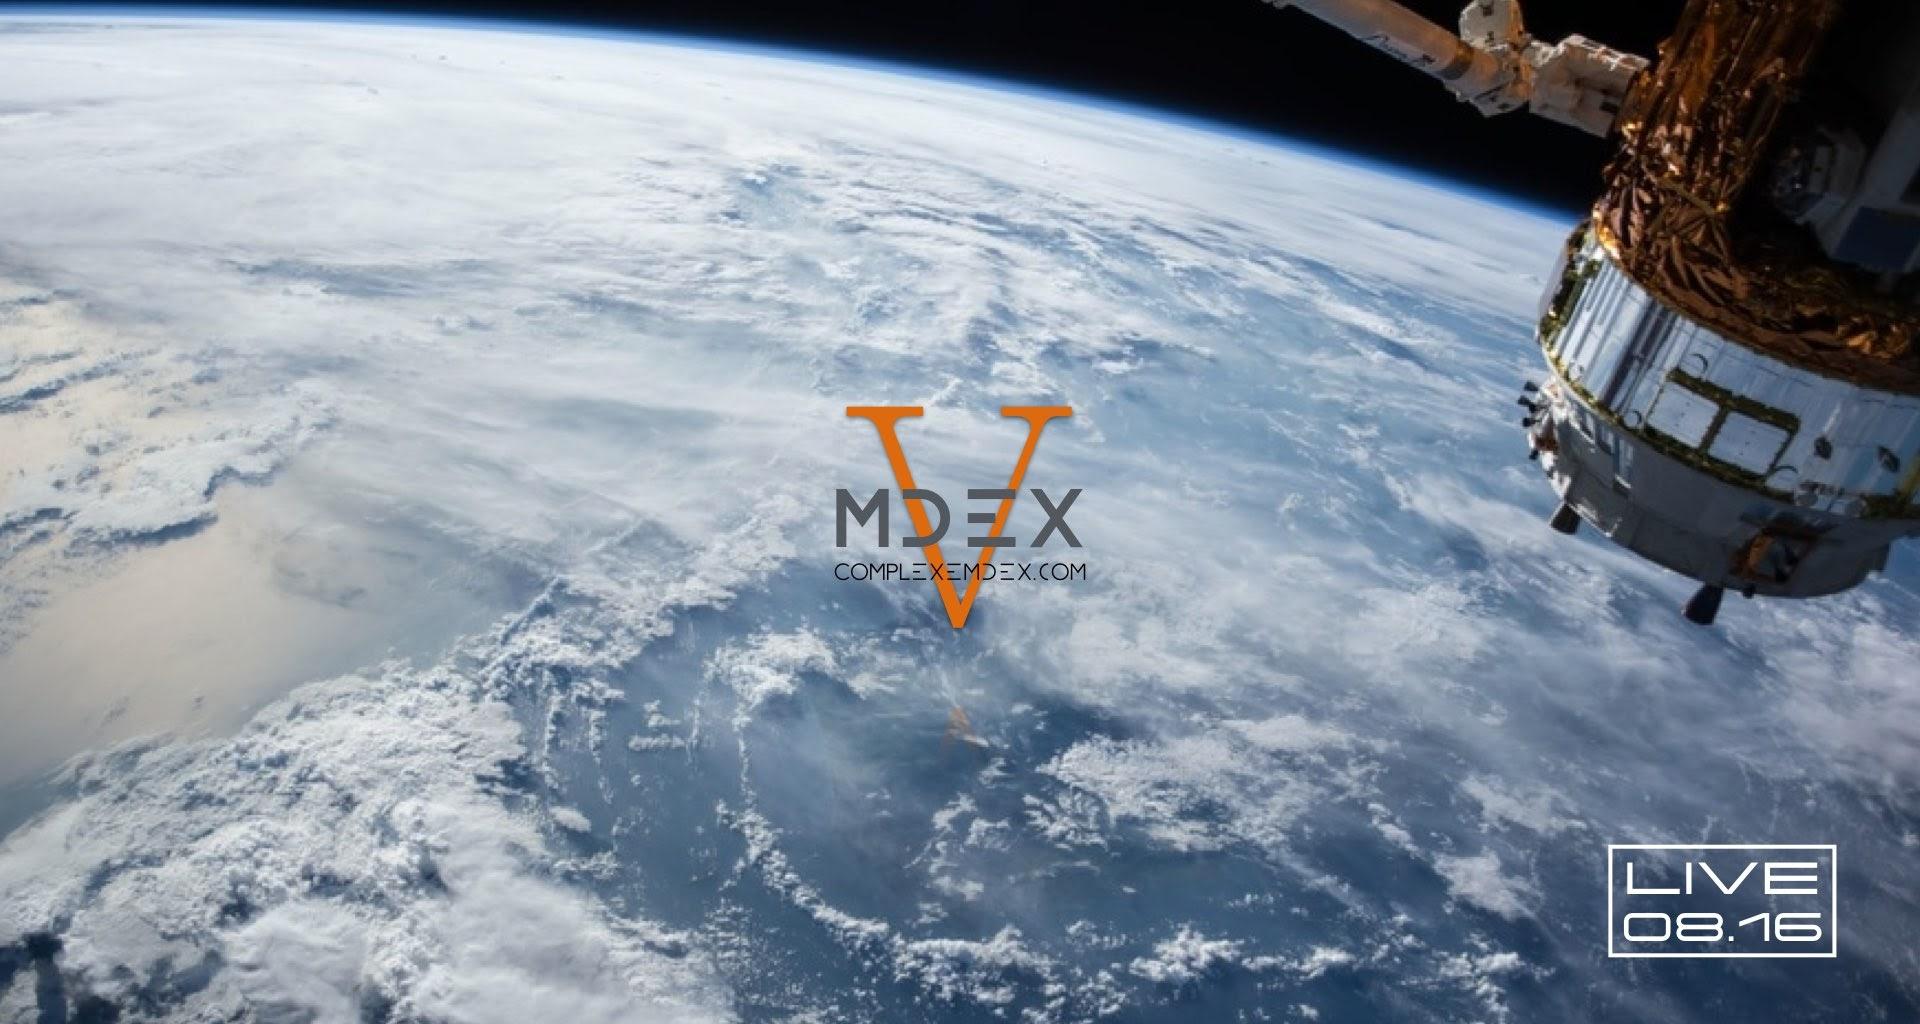 Mdex V Campaign.008.jpeg